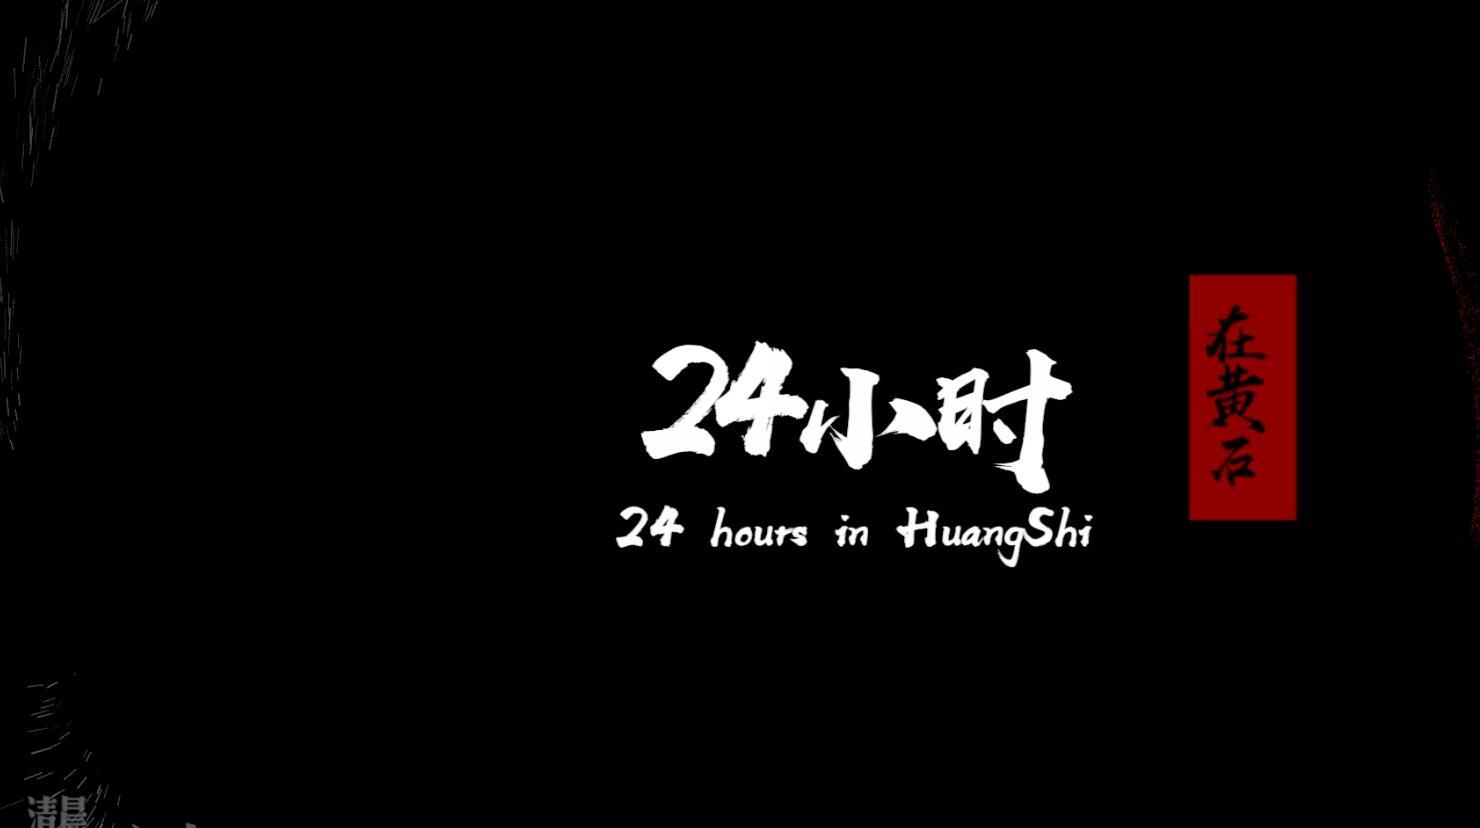 title='黄石文旅宣传片《24小时在黄石》'